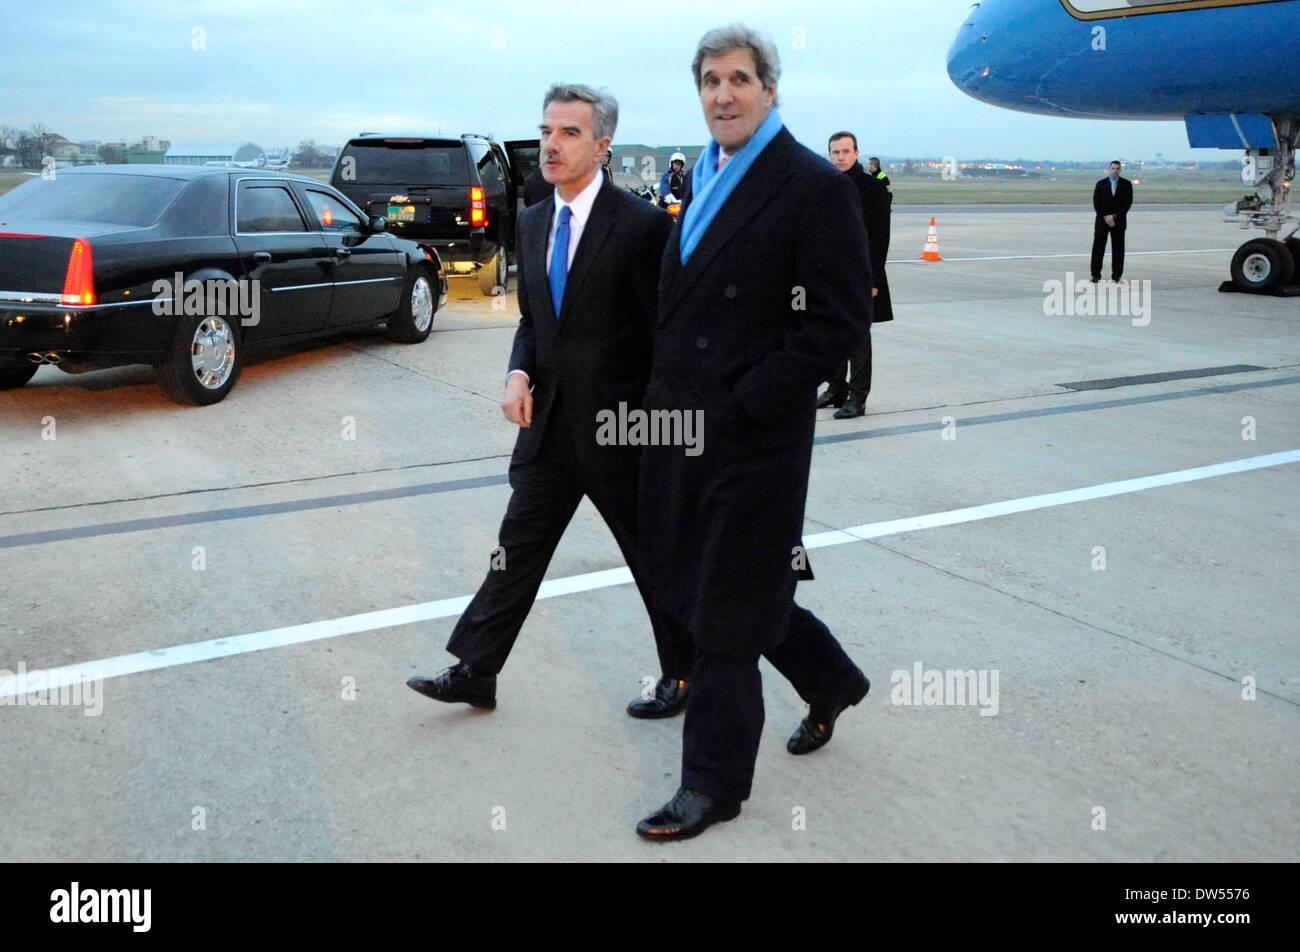 Chargé D'Affaires Taplin Greets Secretary Kerry Upon Arrival in Paris - Stock Image